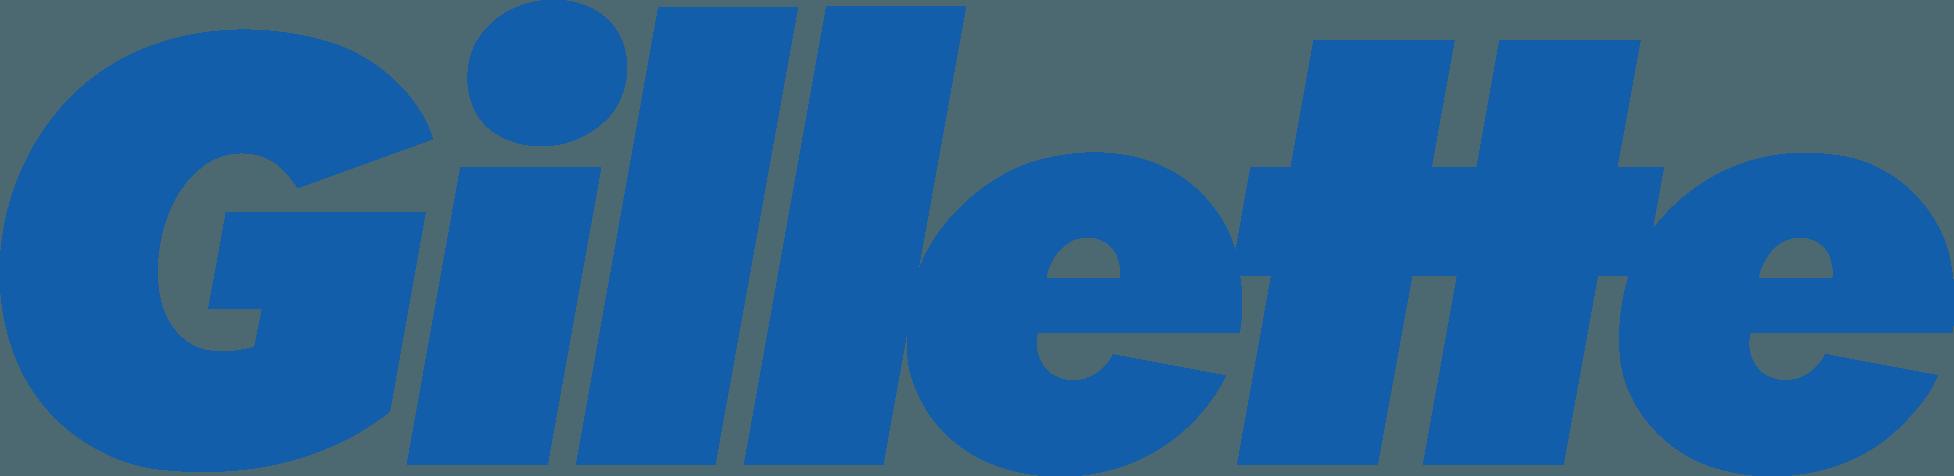 gillette logo-2